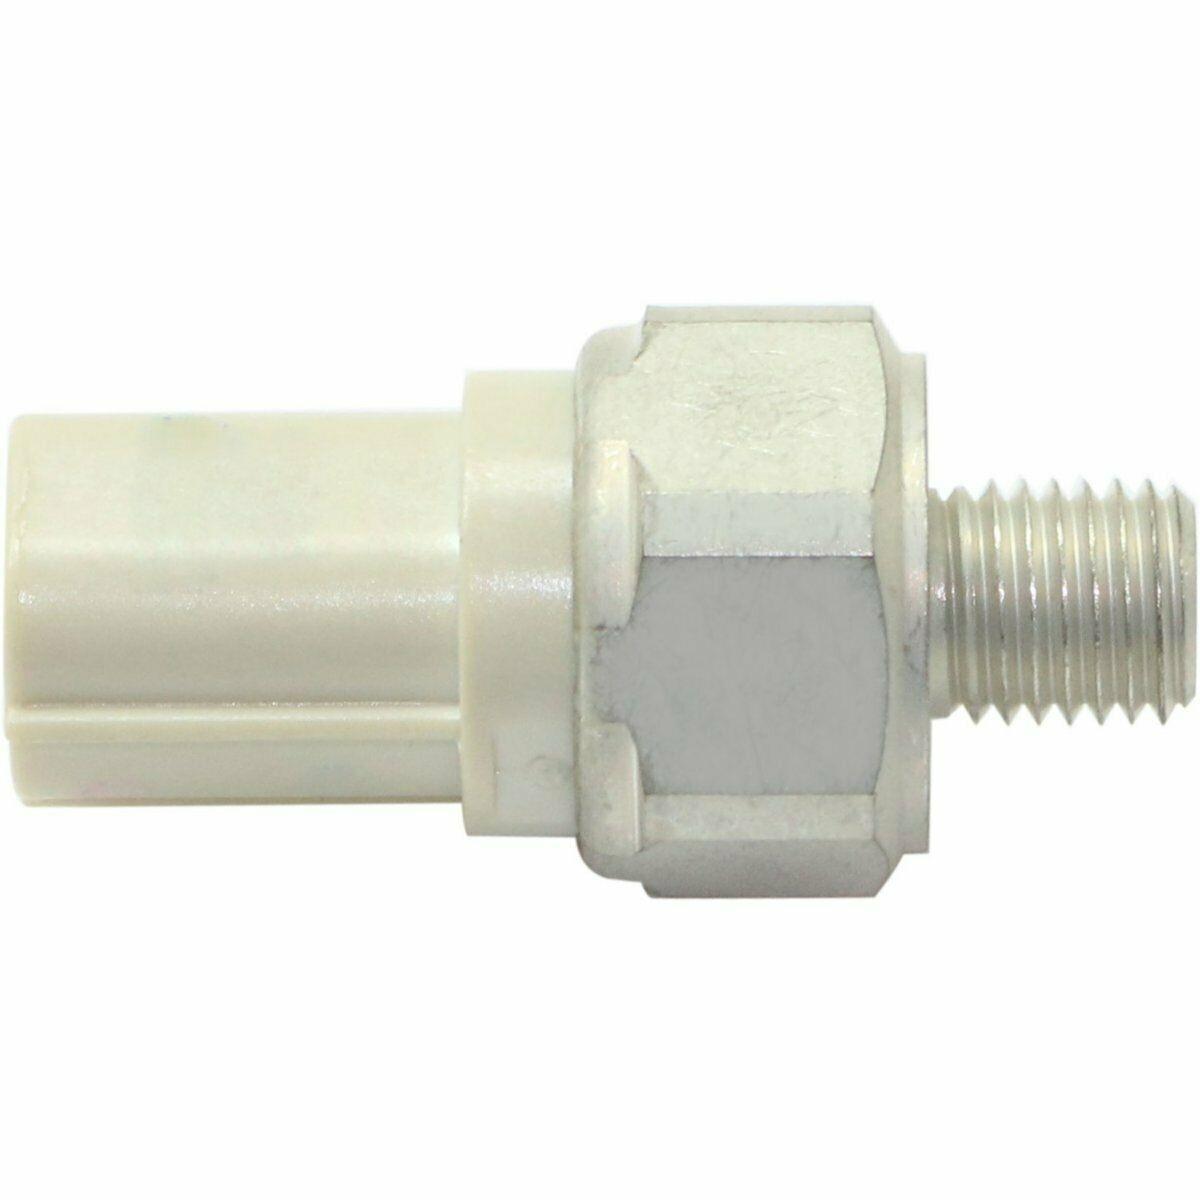 OTS Oil Pressure Switch For Acura MDX 2001-2009